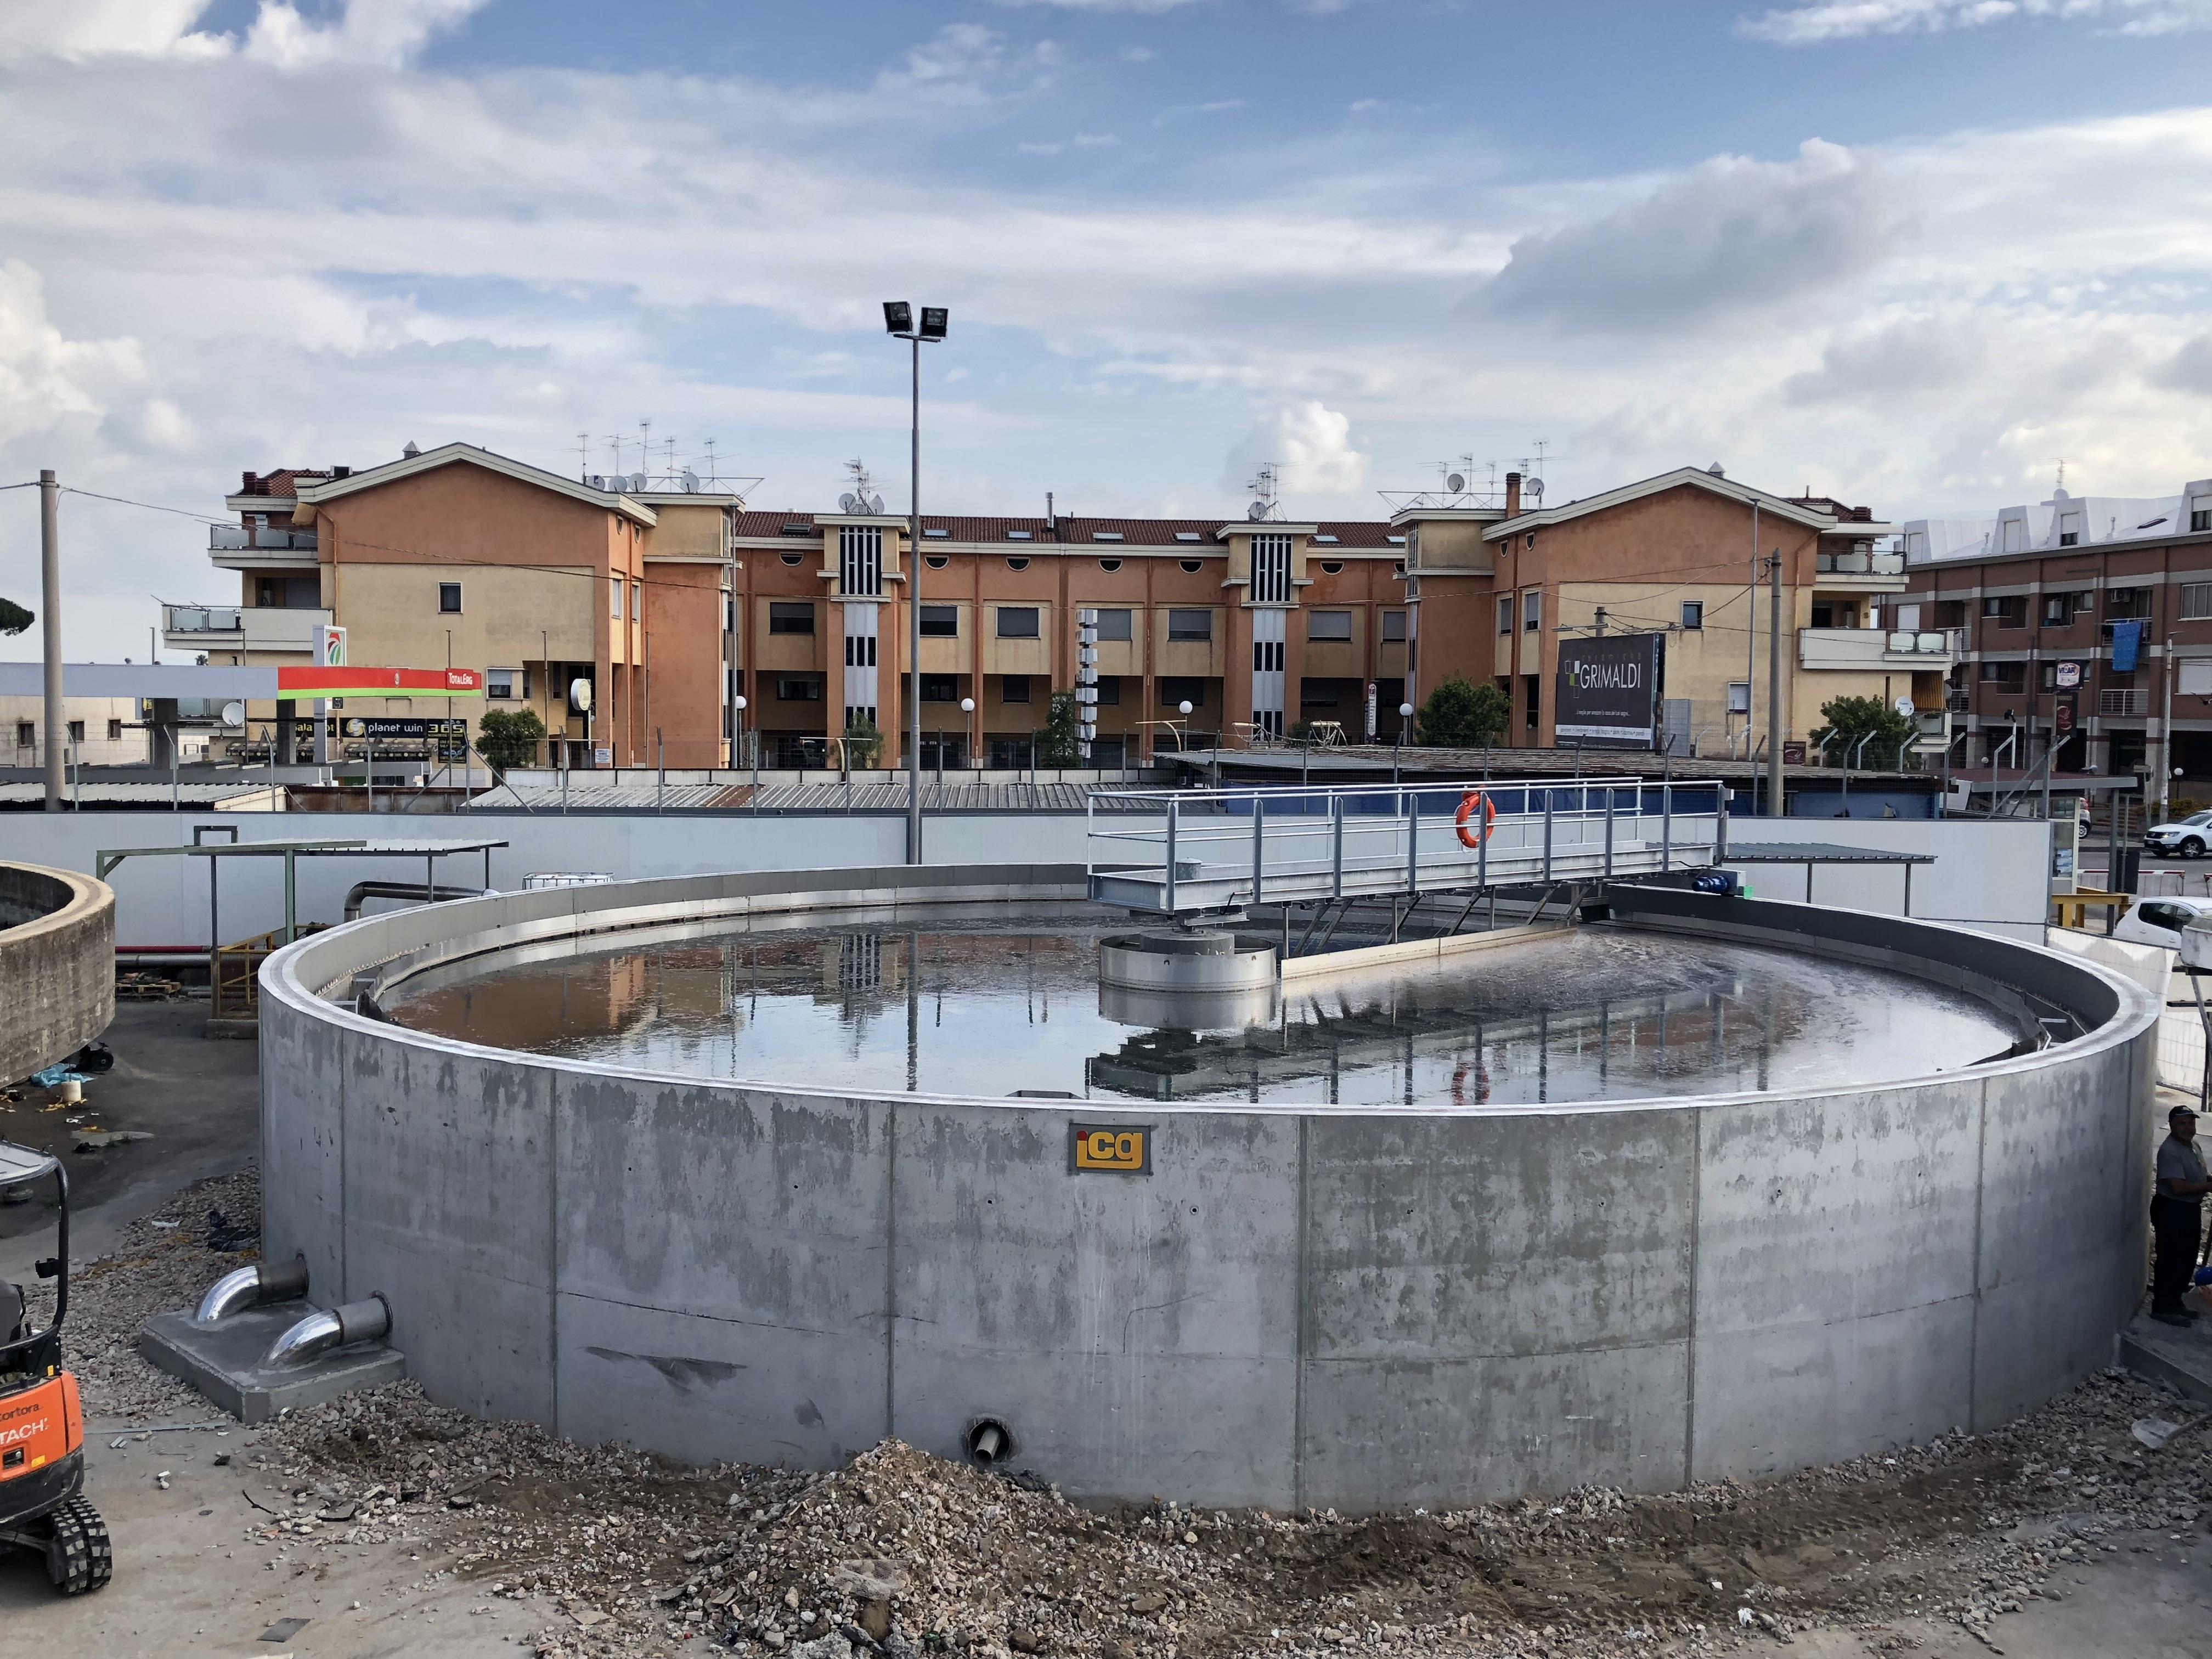 Depuratore La Doria - Angri